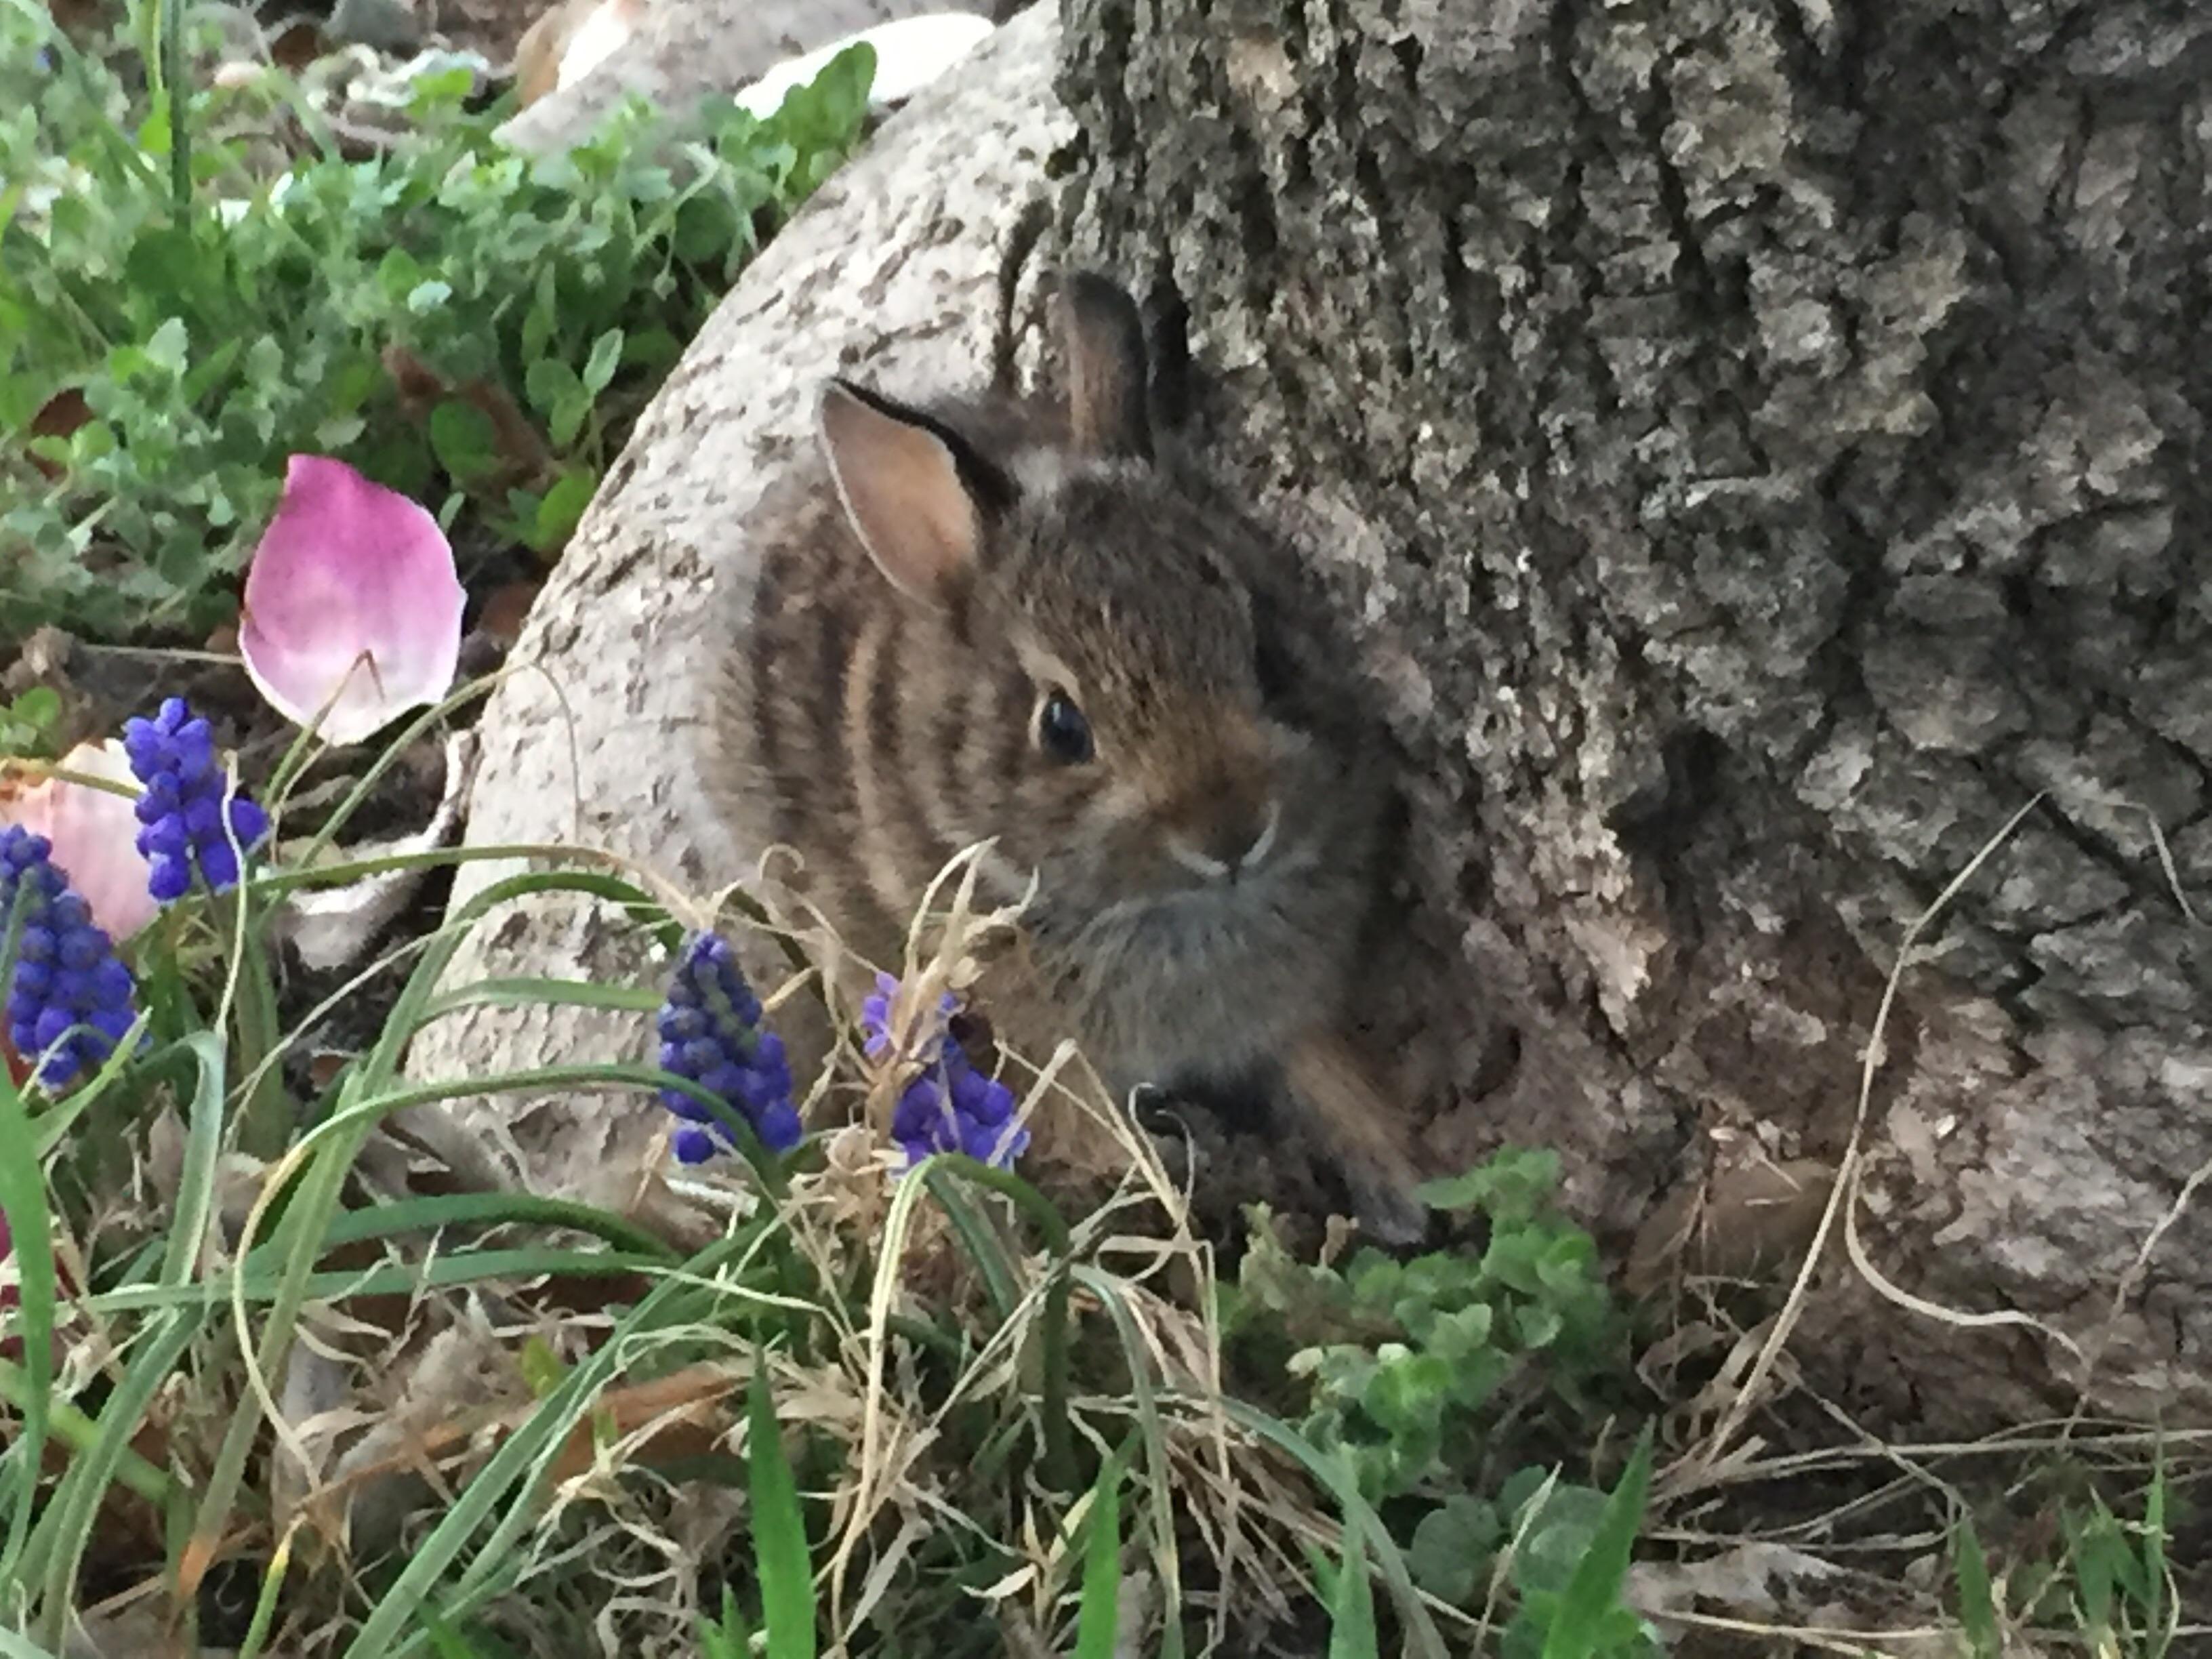 Little baby bunny in my yard https://ift.tt/2IRIVUF | Baby ...